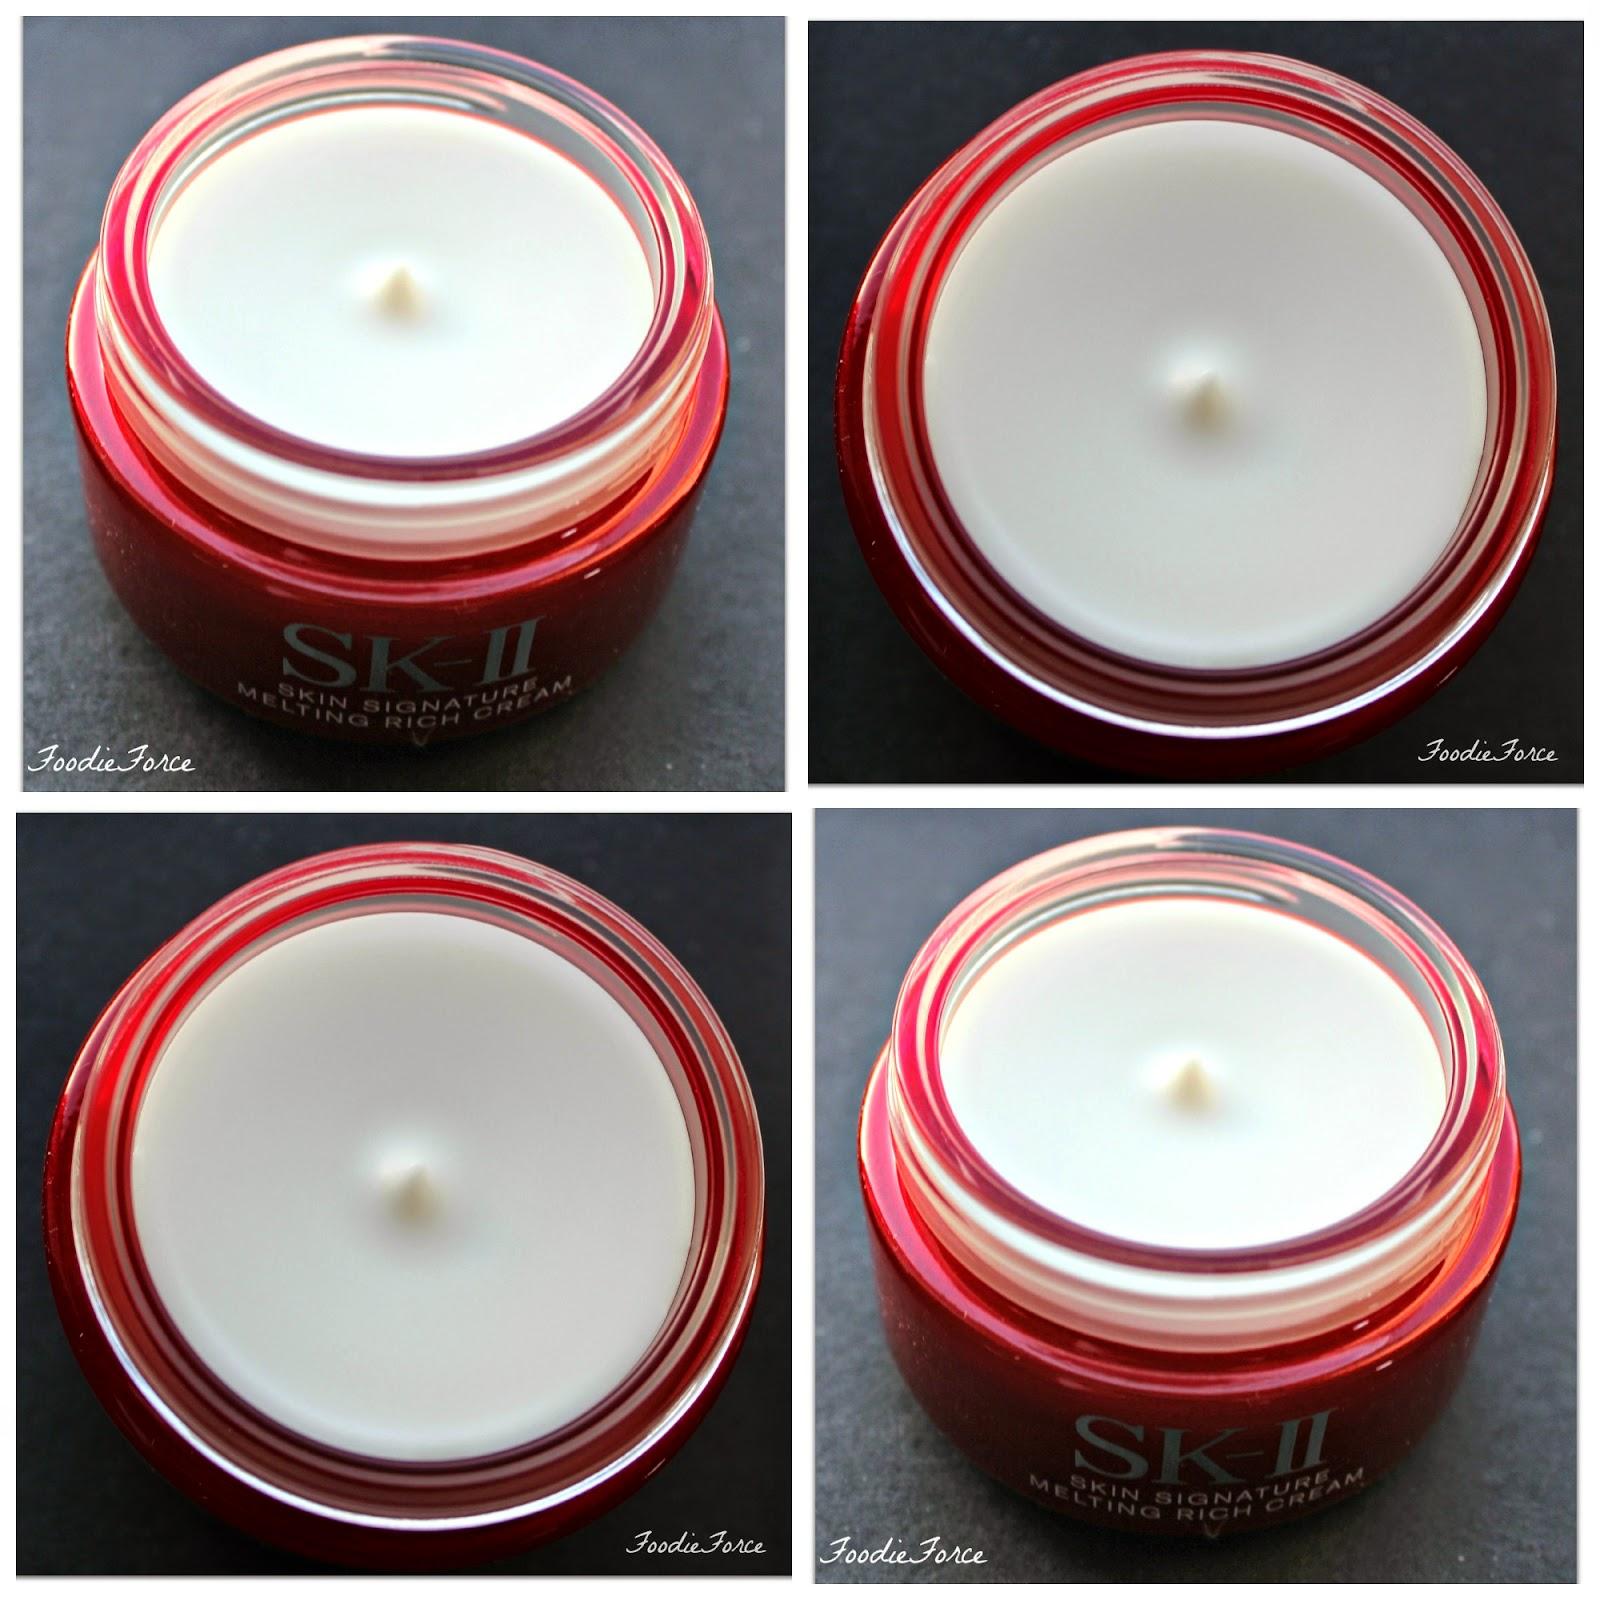 Skin Signature Melting Rich Cream - SK-ll